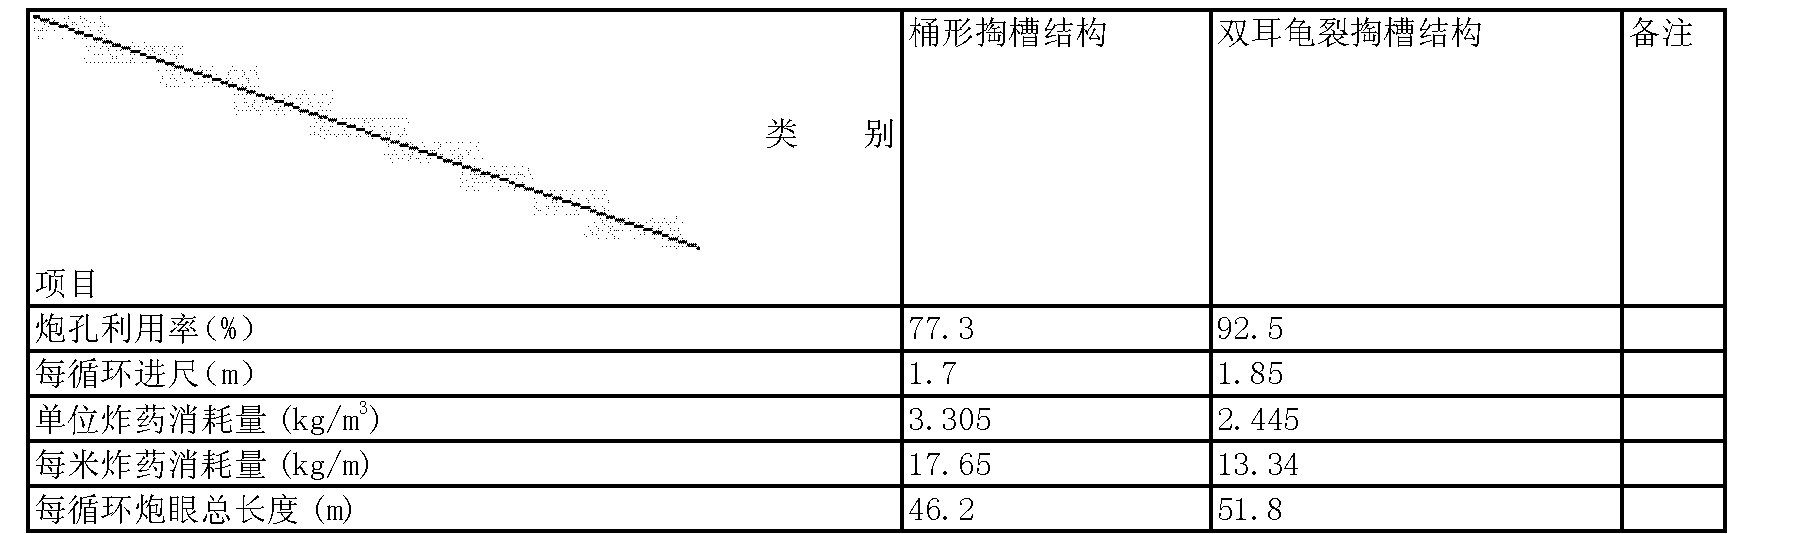 Figure CN202836383UD00041